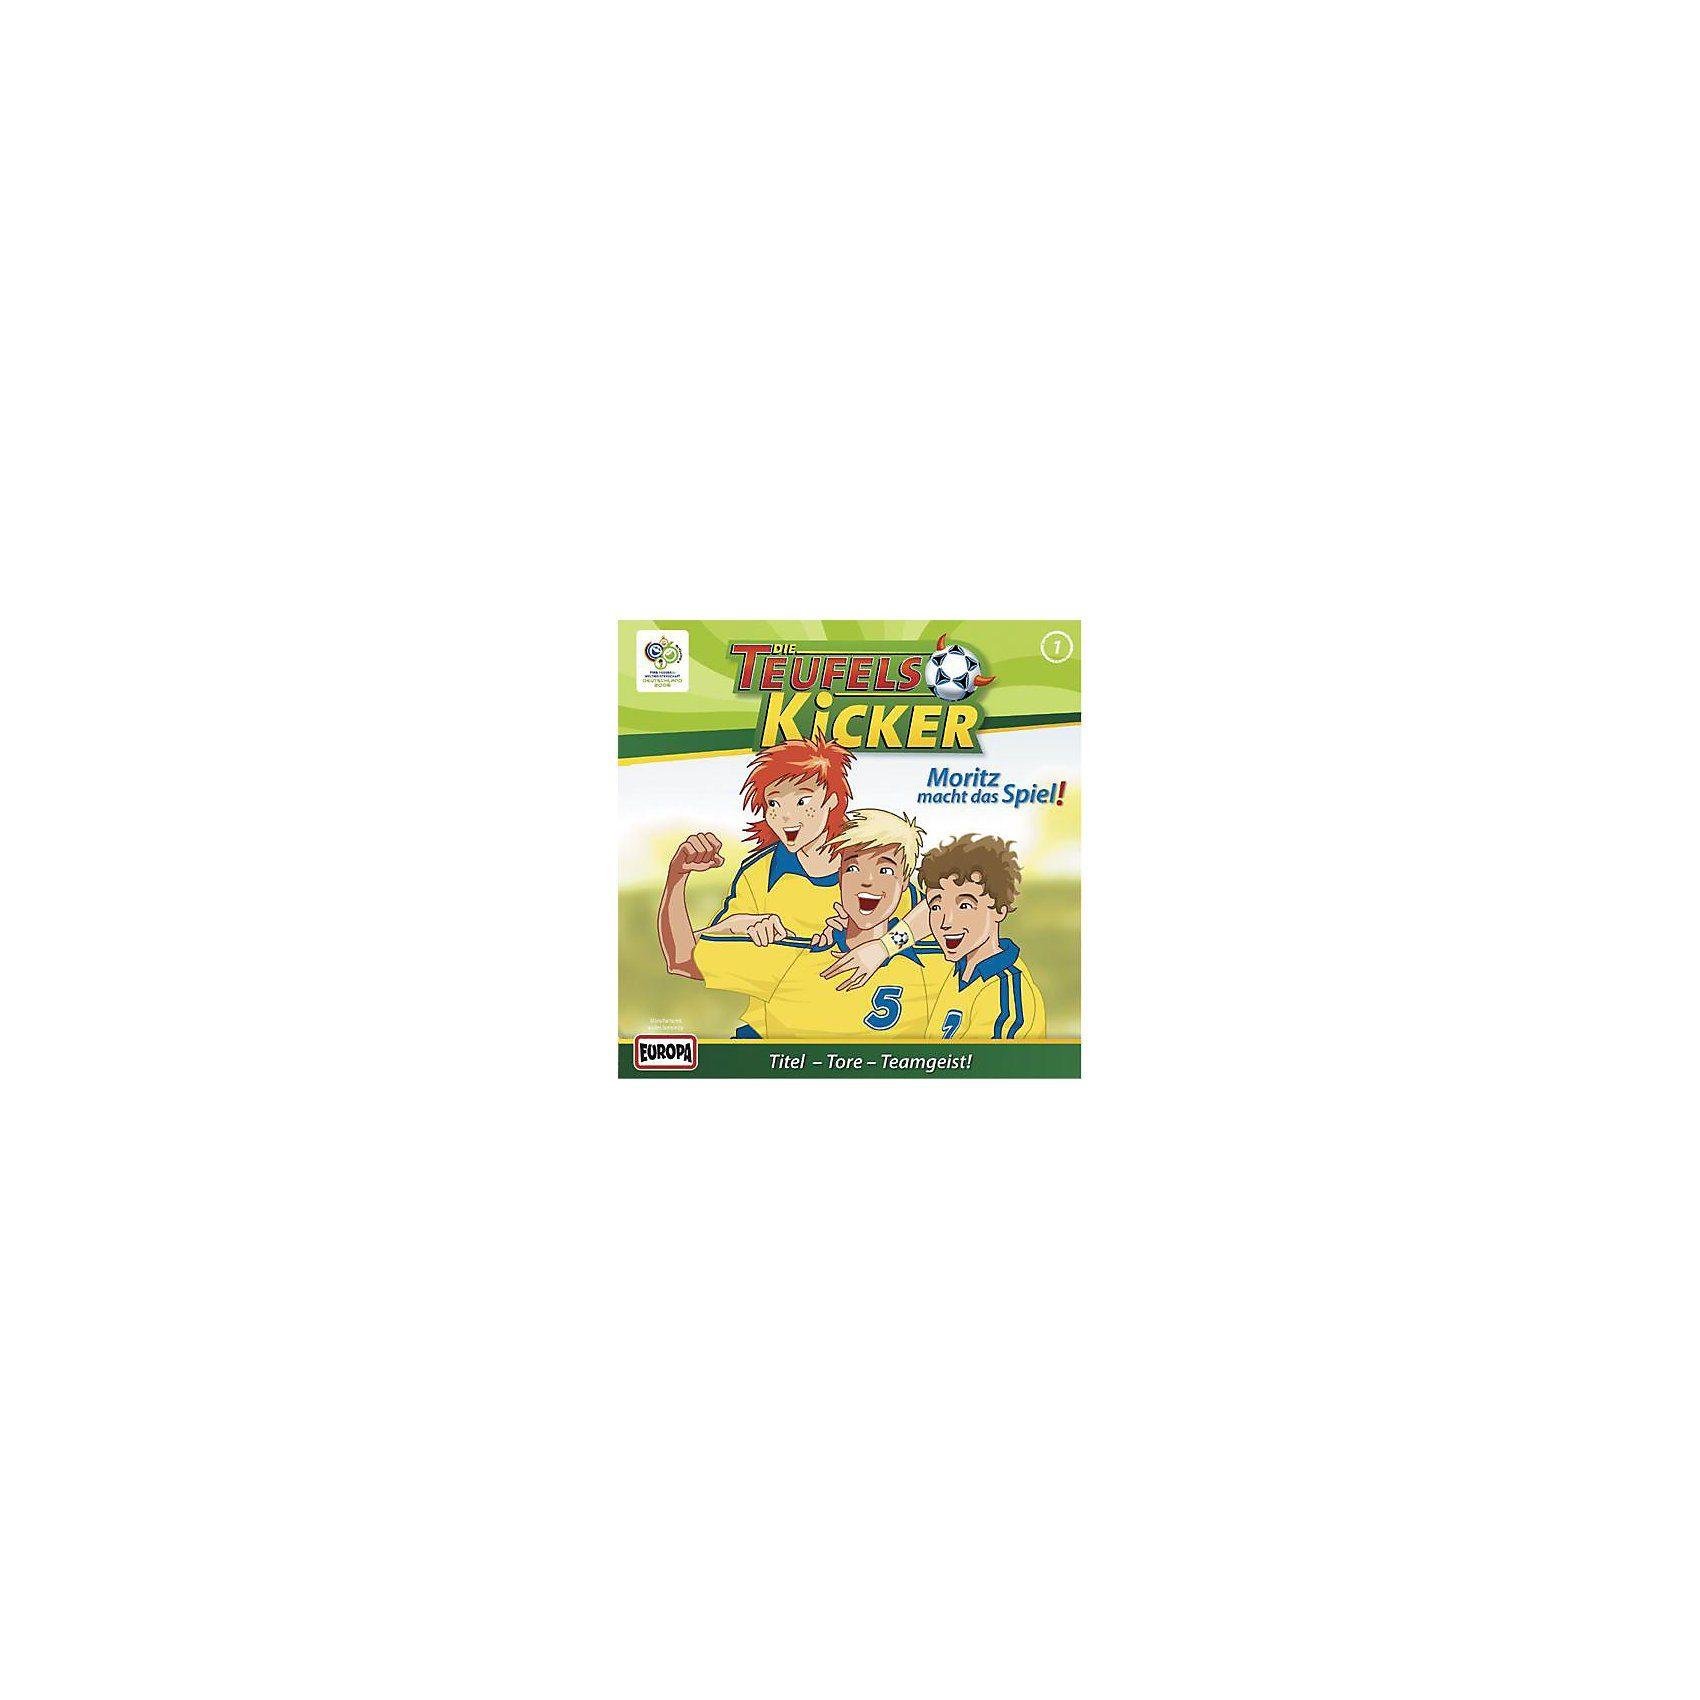 Sony CD Teufelskicker 01 - Moritz macht das Spiel!